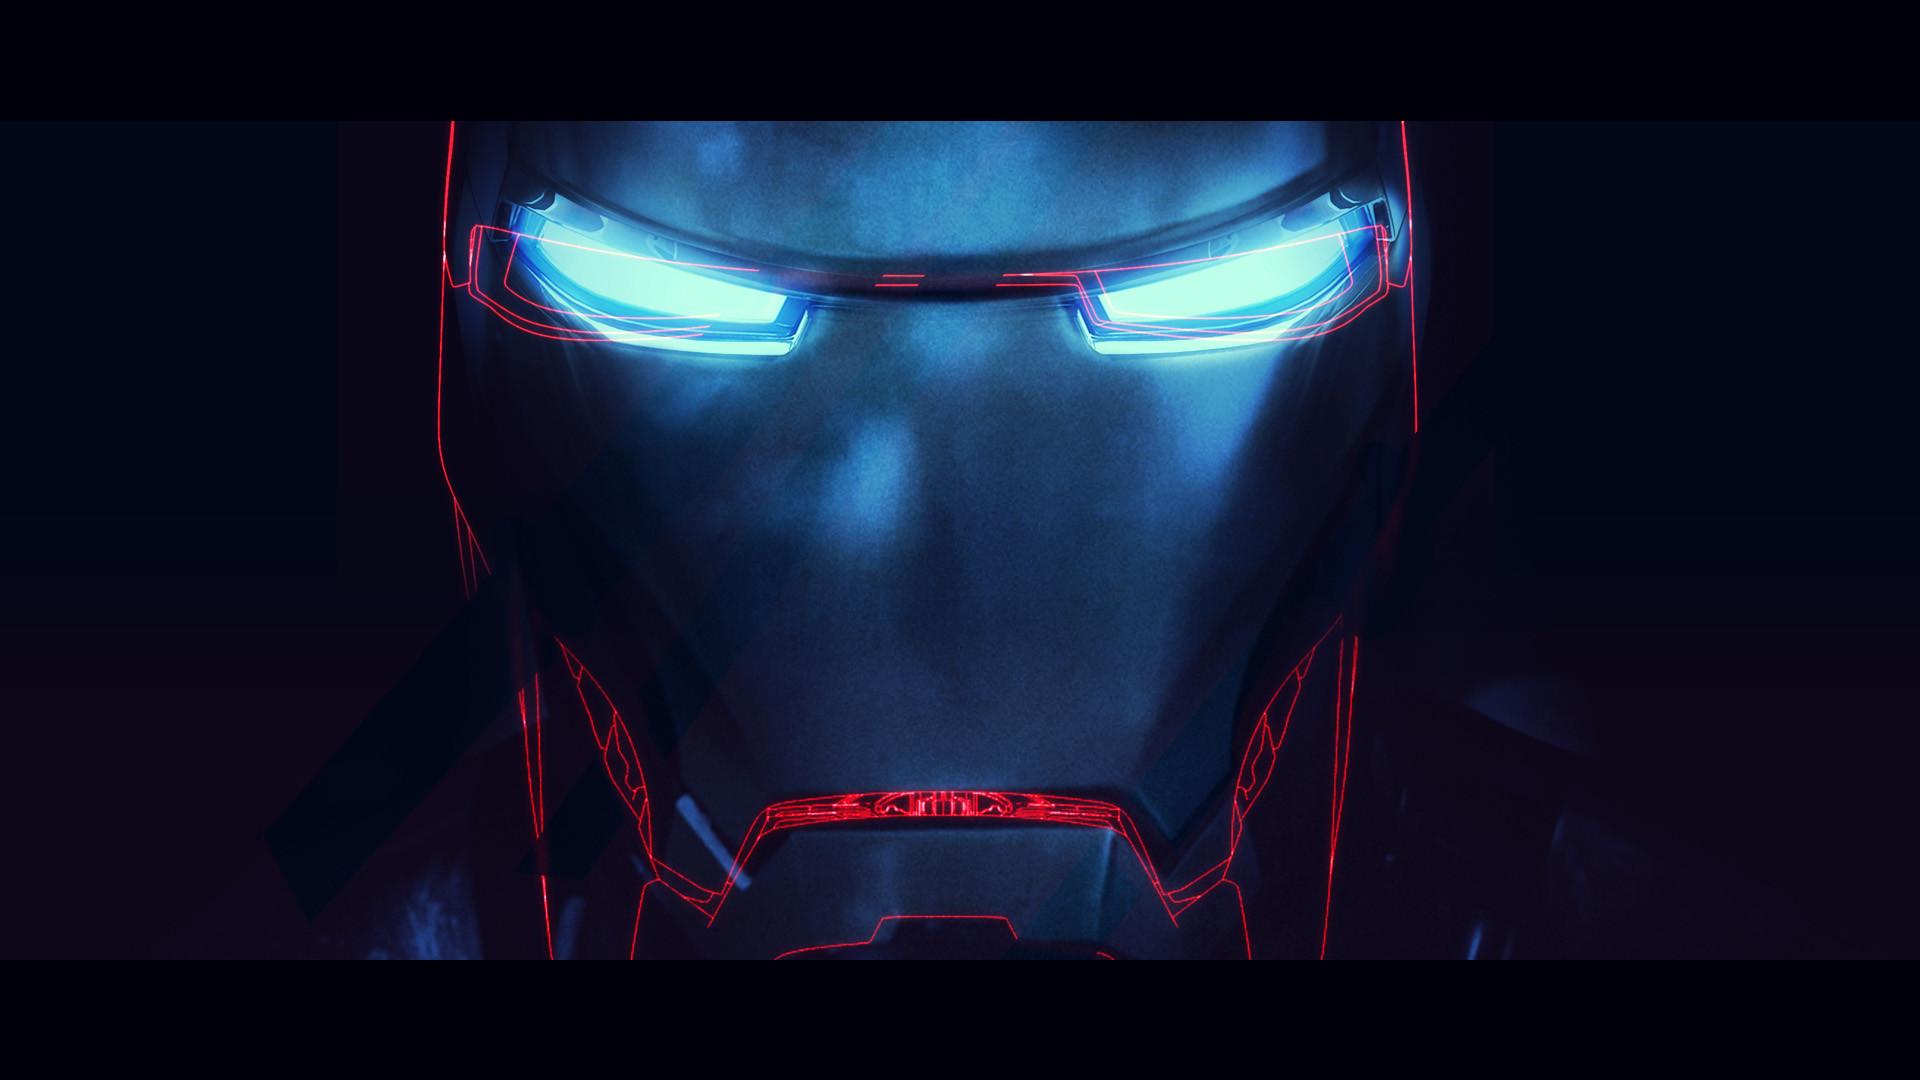 Iron Man 3 Computer Wallpapers, Desktop Backgrounds | | ID .